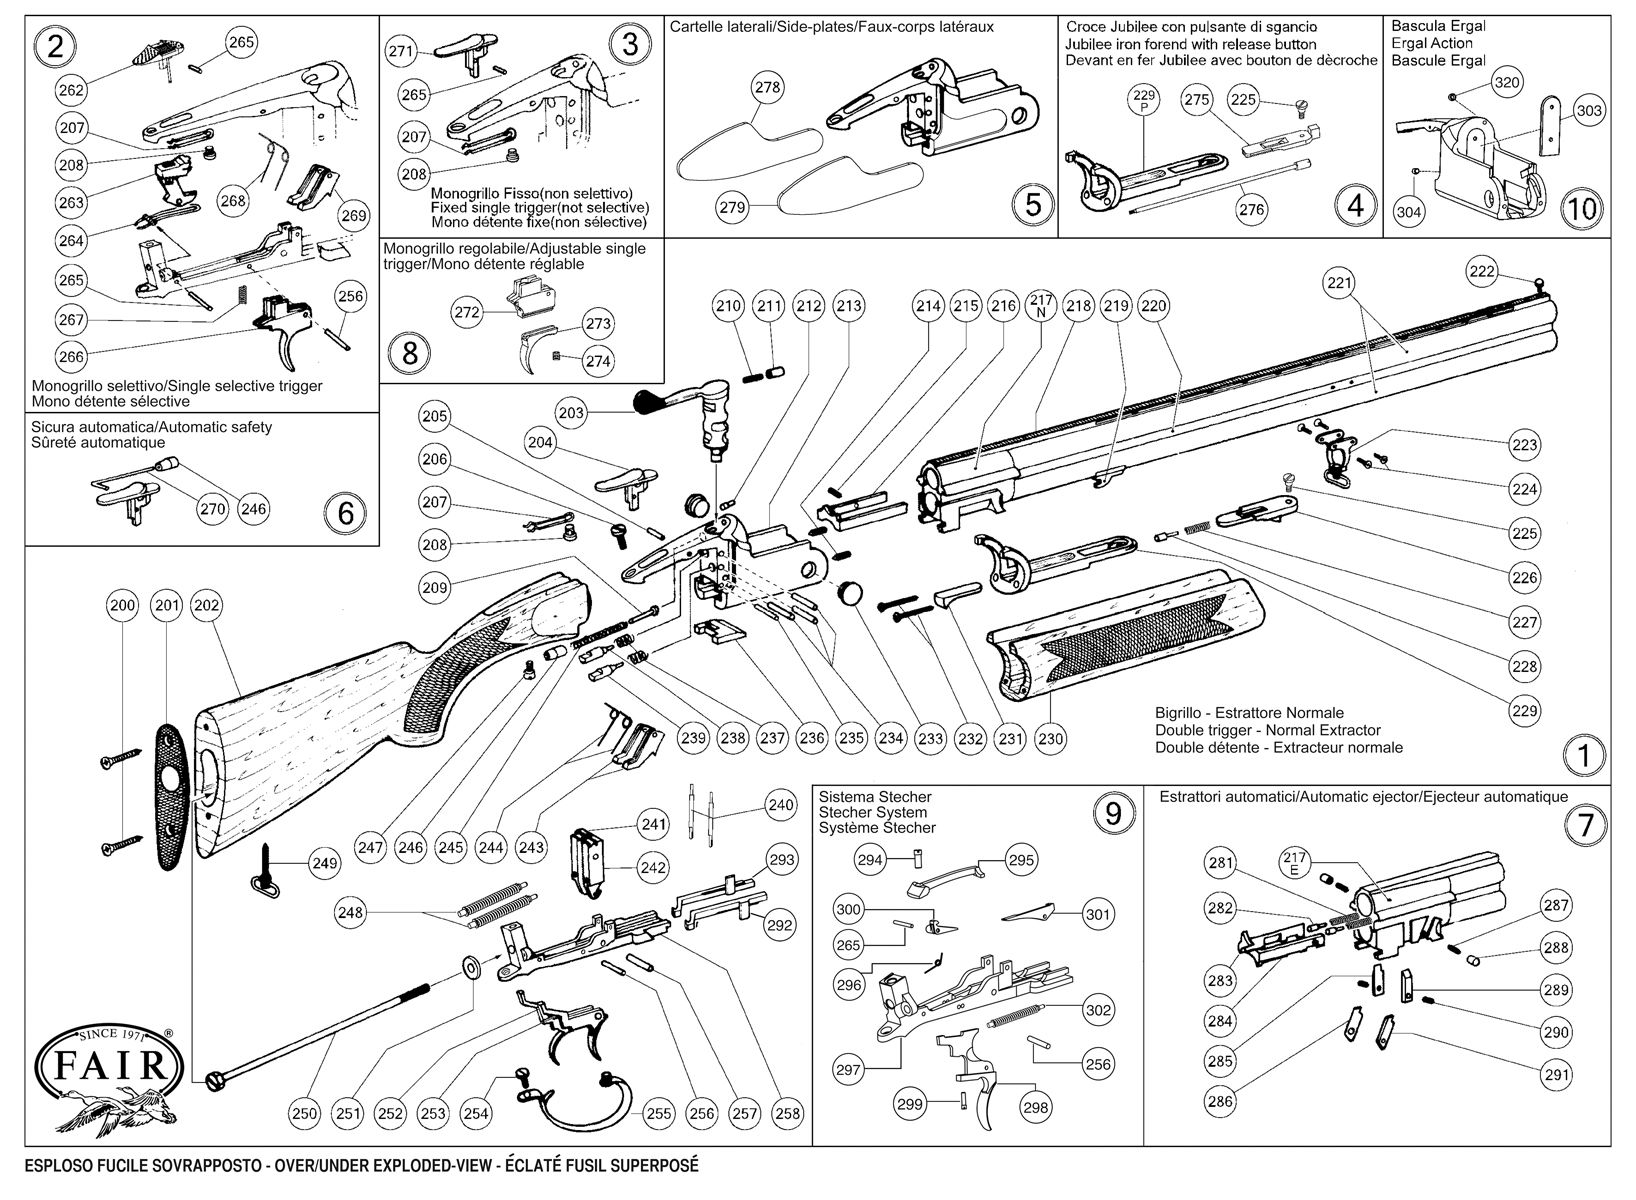 lincoln shotgun spare parts